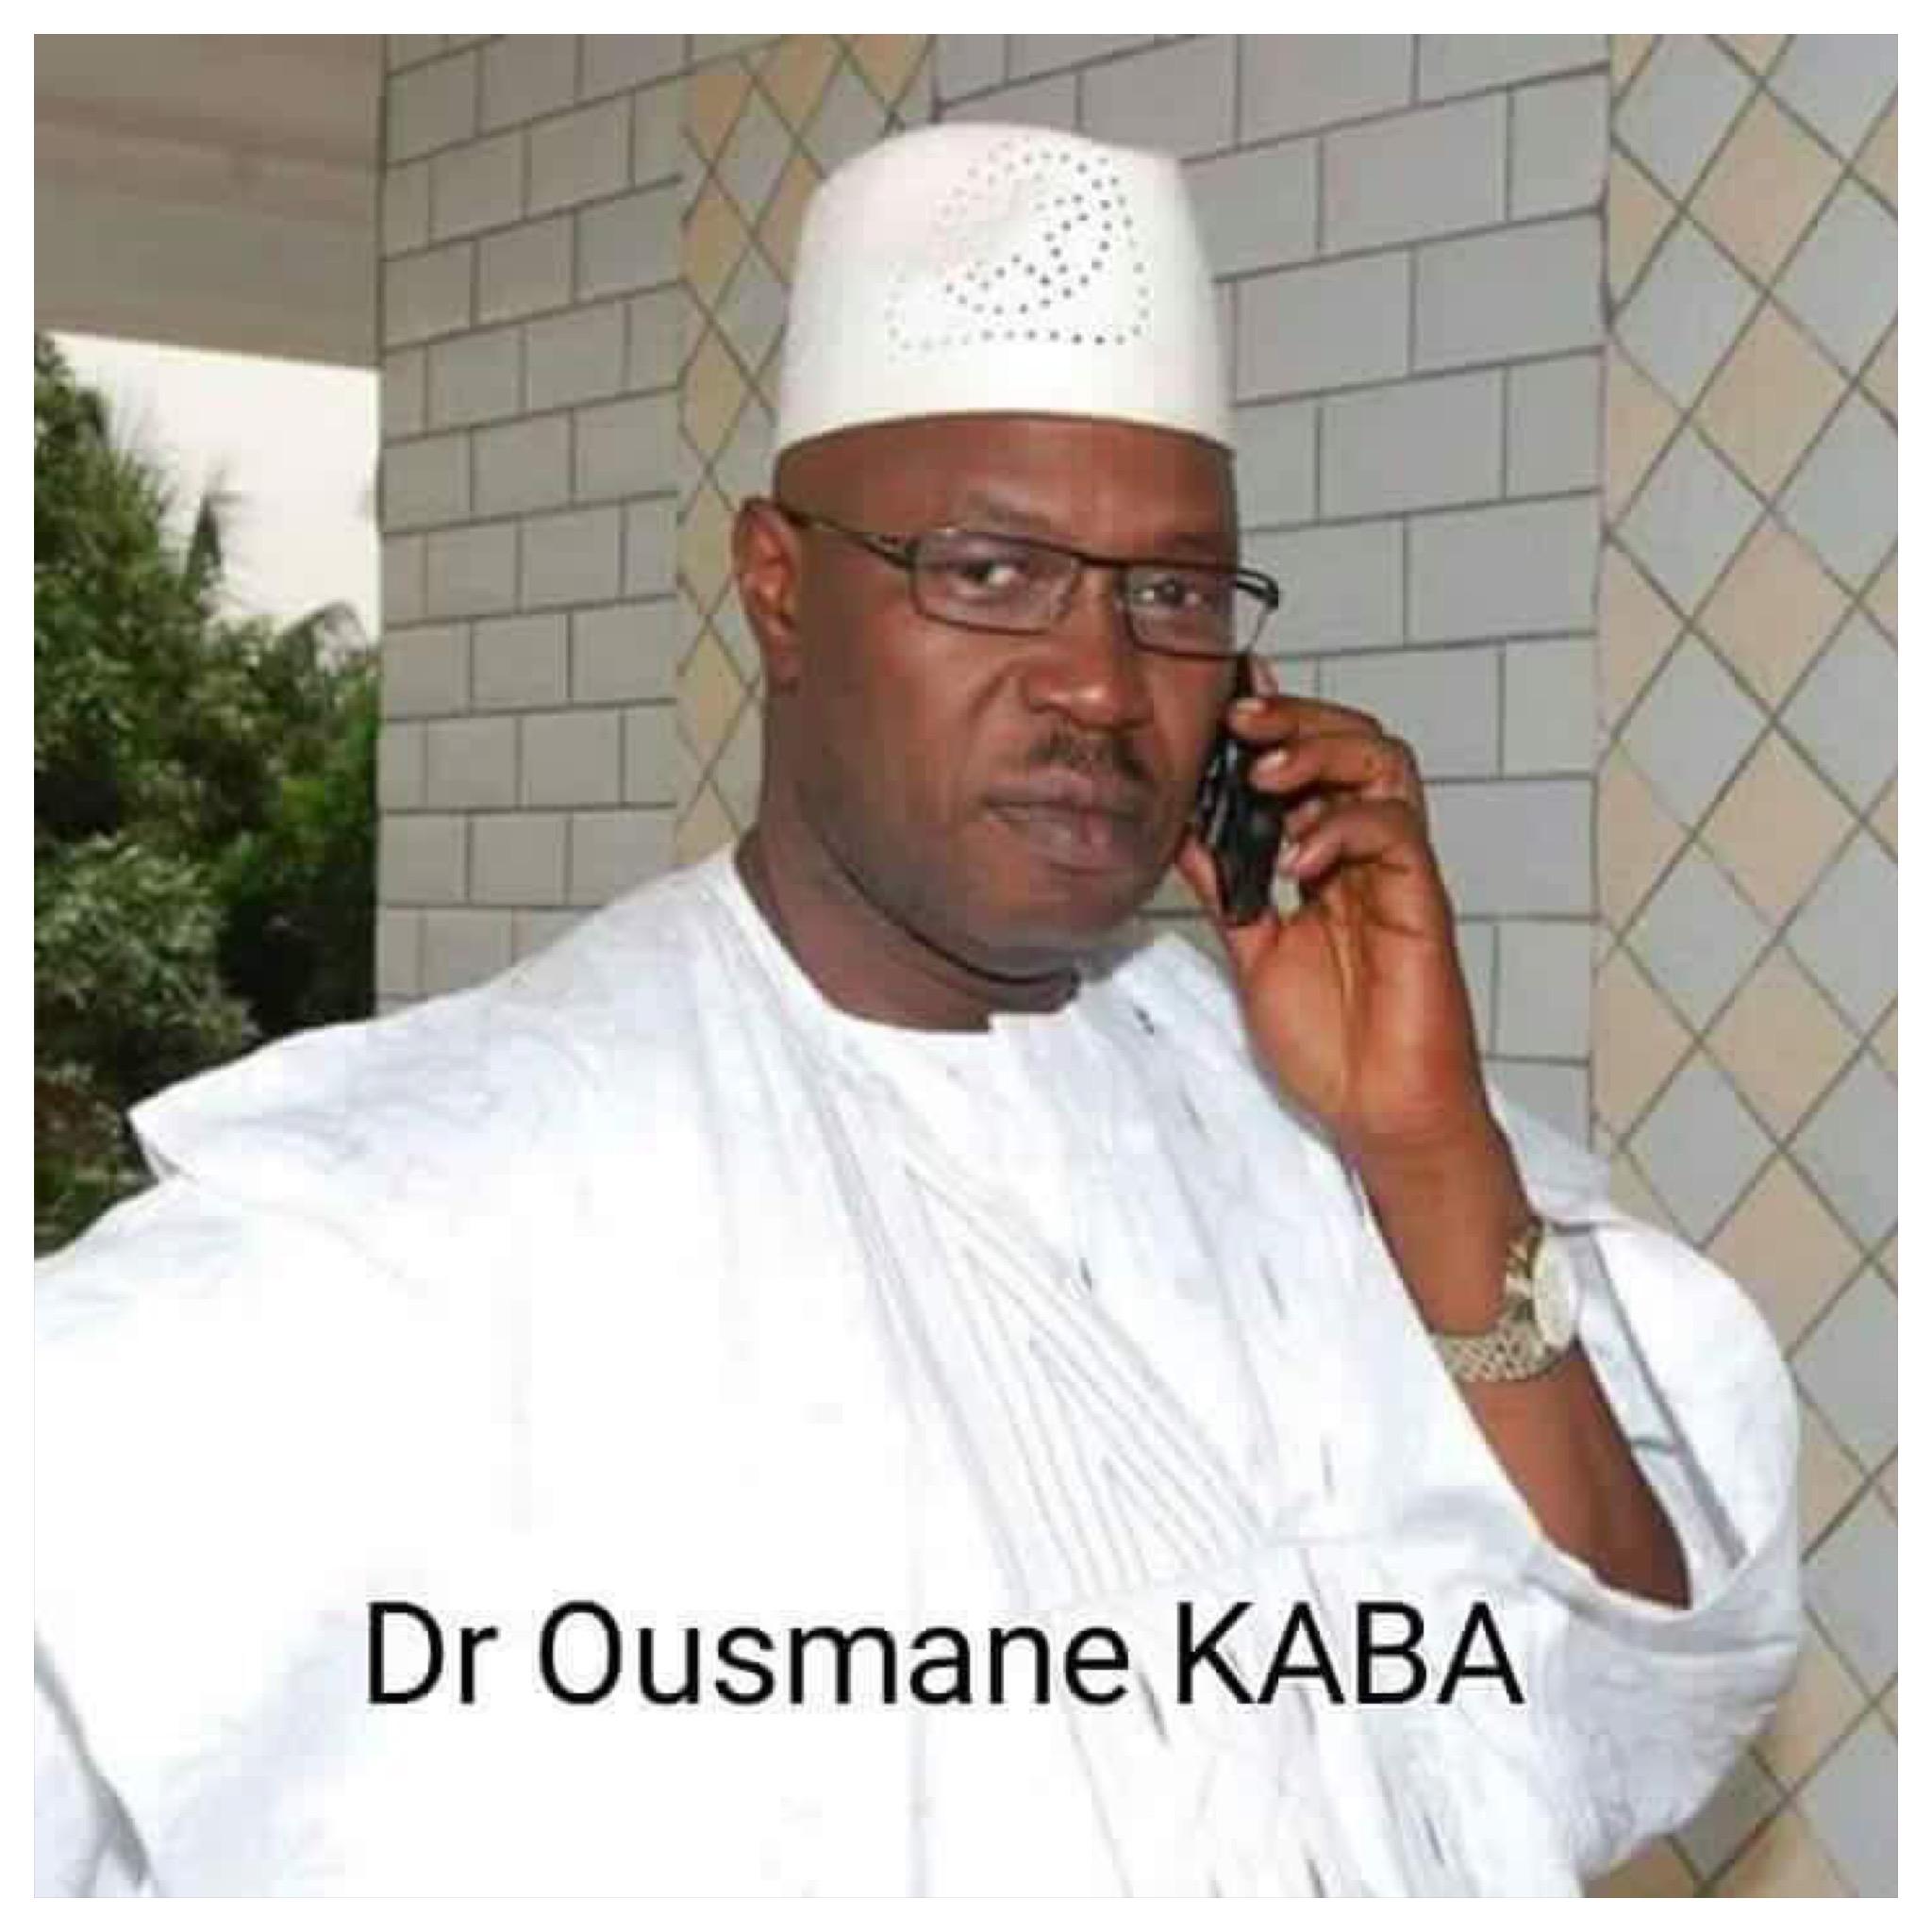 Ousmane Kaba Guinee